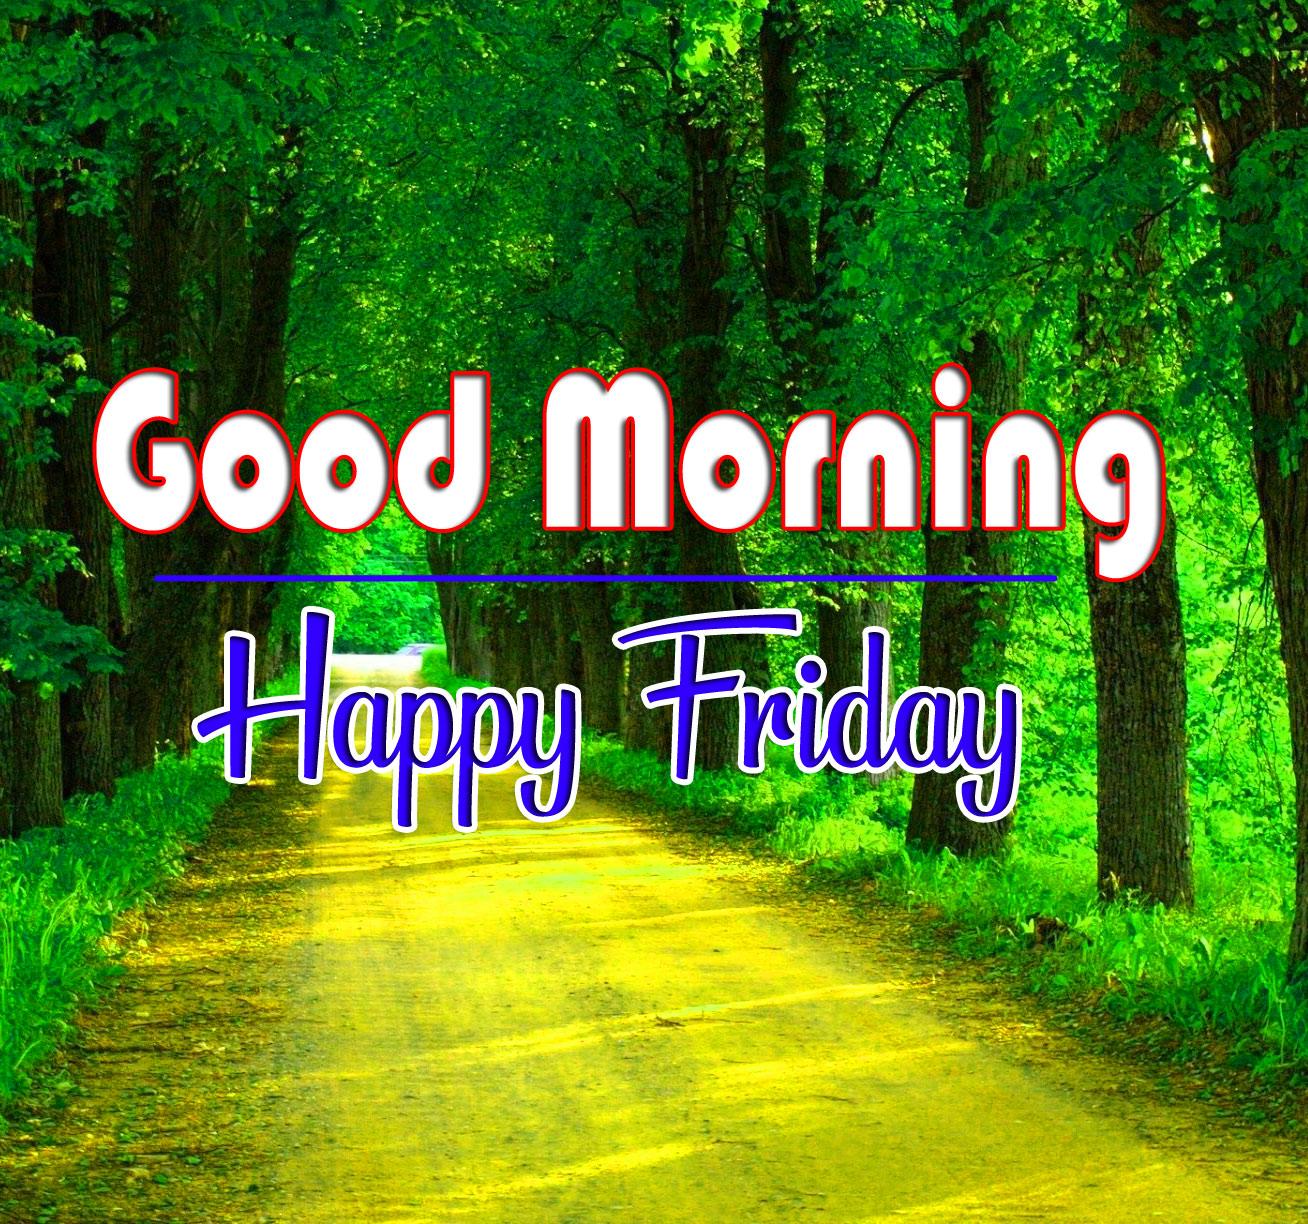 Free HD friday Good morning Imagea